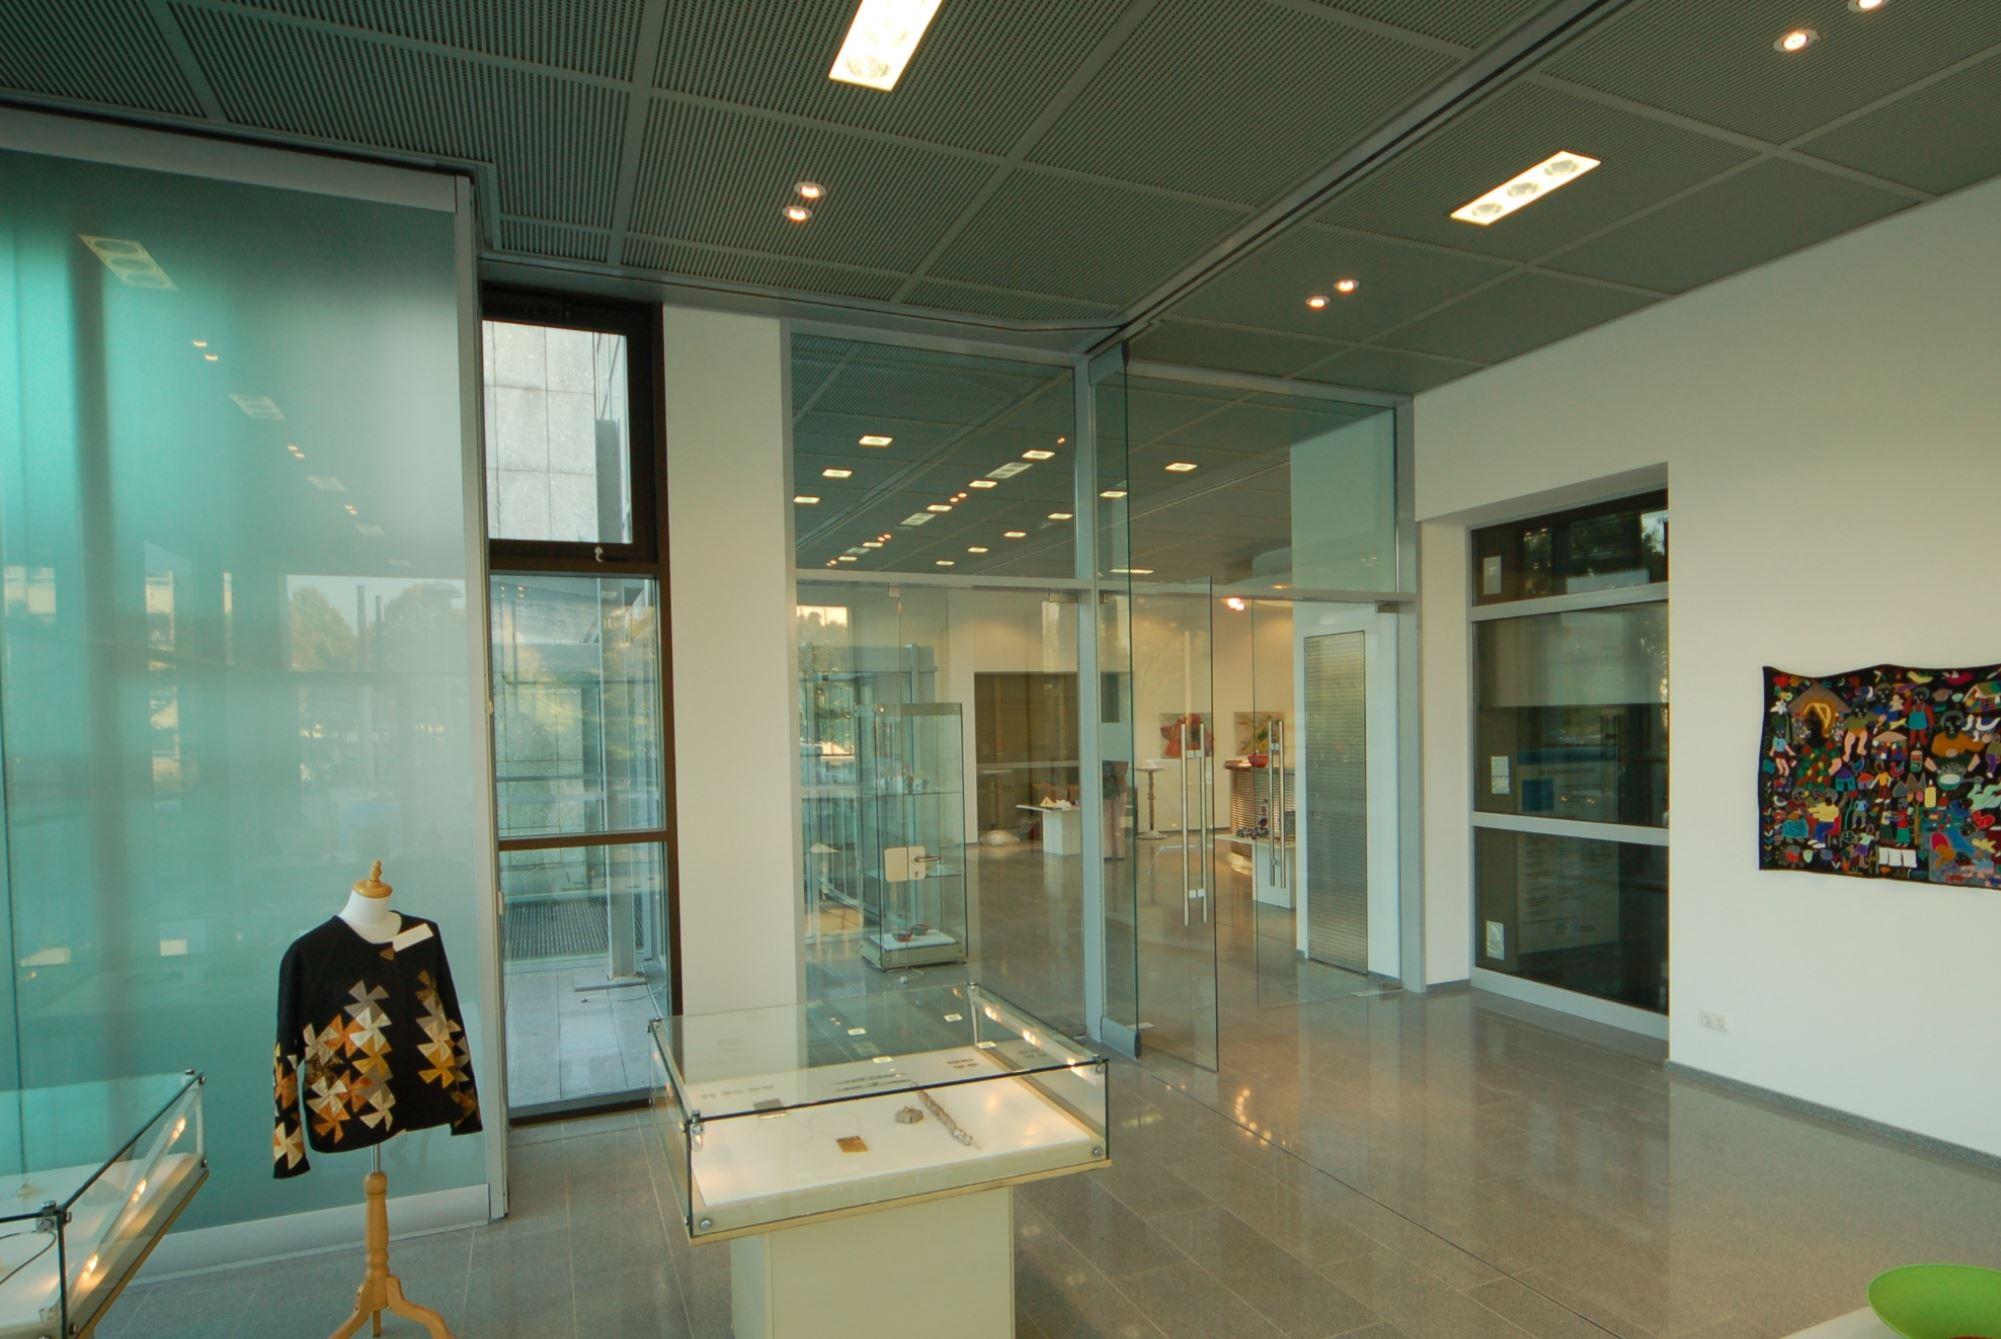 HWK Saarland Handwerkskammer des Saarlandes Janek Pfeufer Architektur